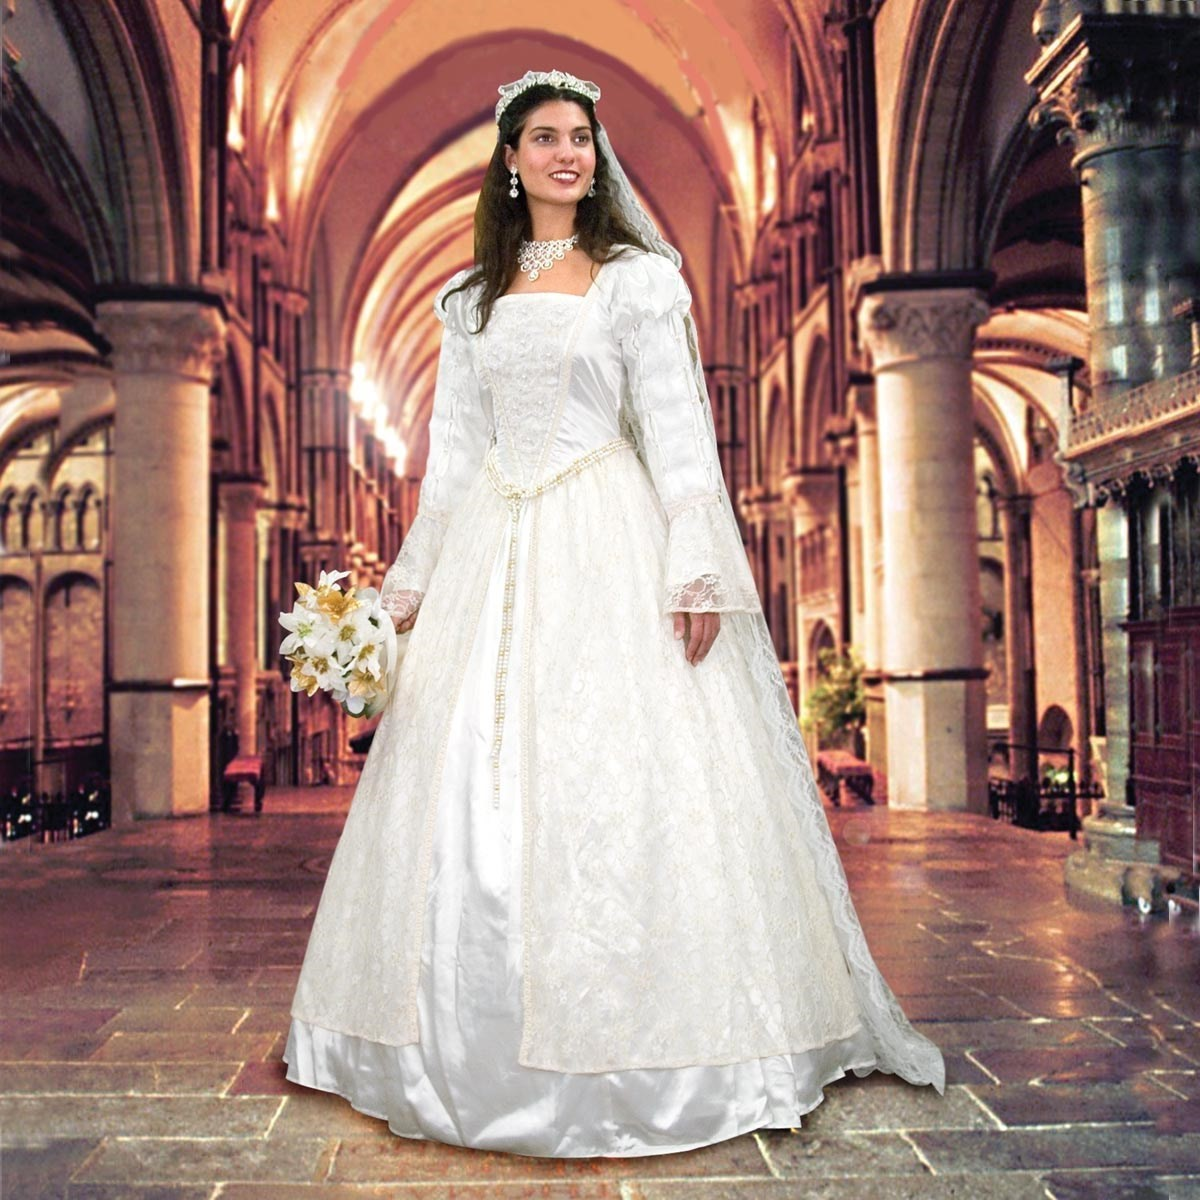 Renaissance Wedding Gown & Veil